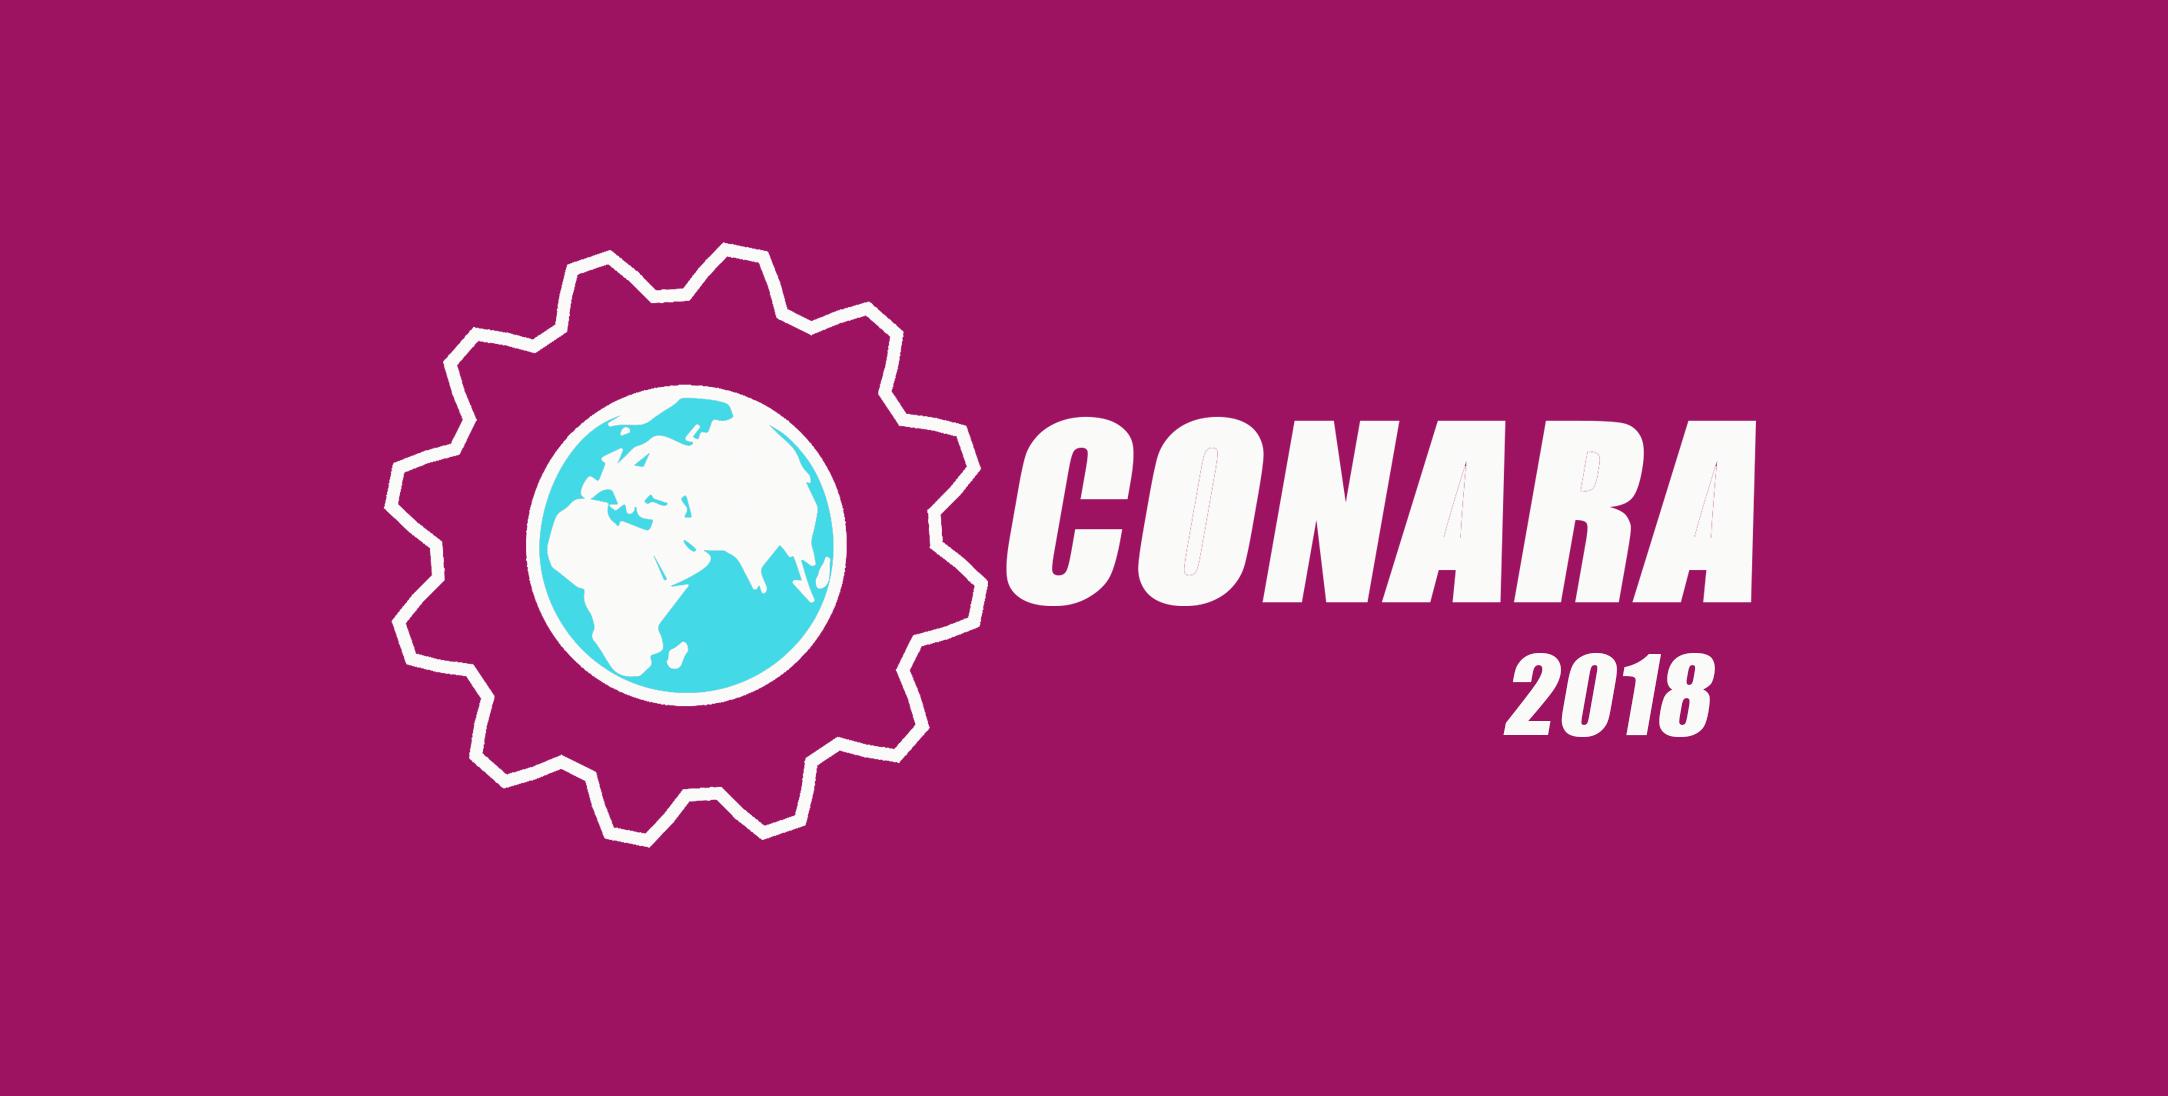 conara